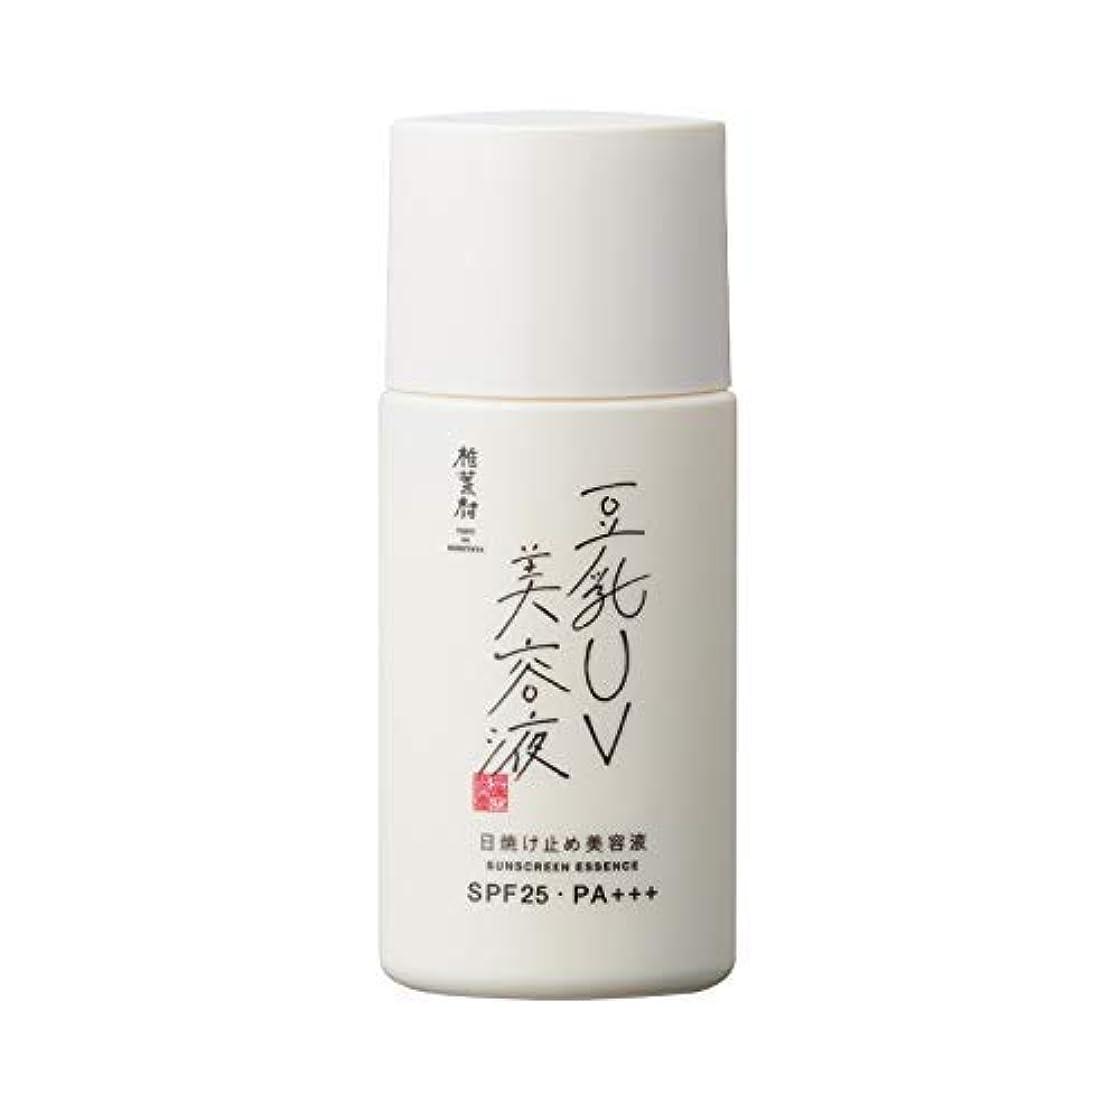 ワイプ白雪姫省豆腐の盛田屋 豆乳UV美容液 自然生活 30mL